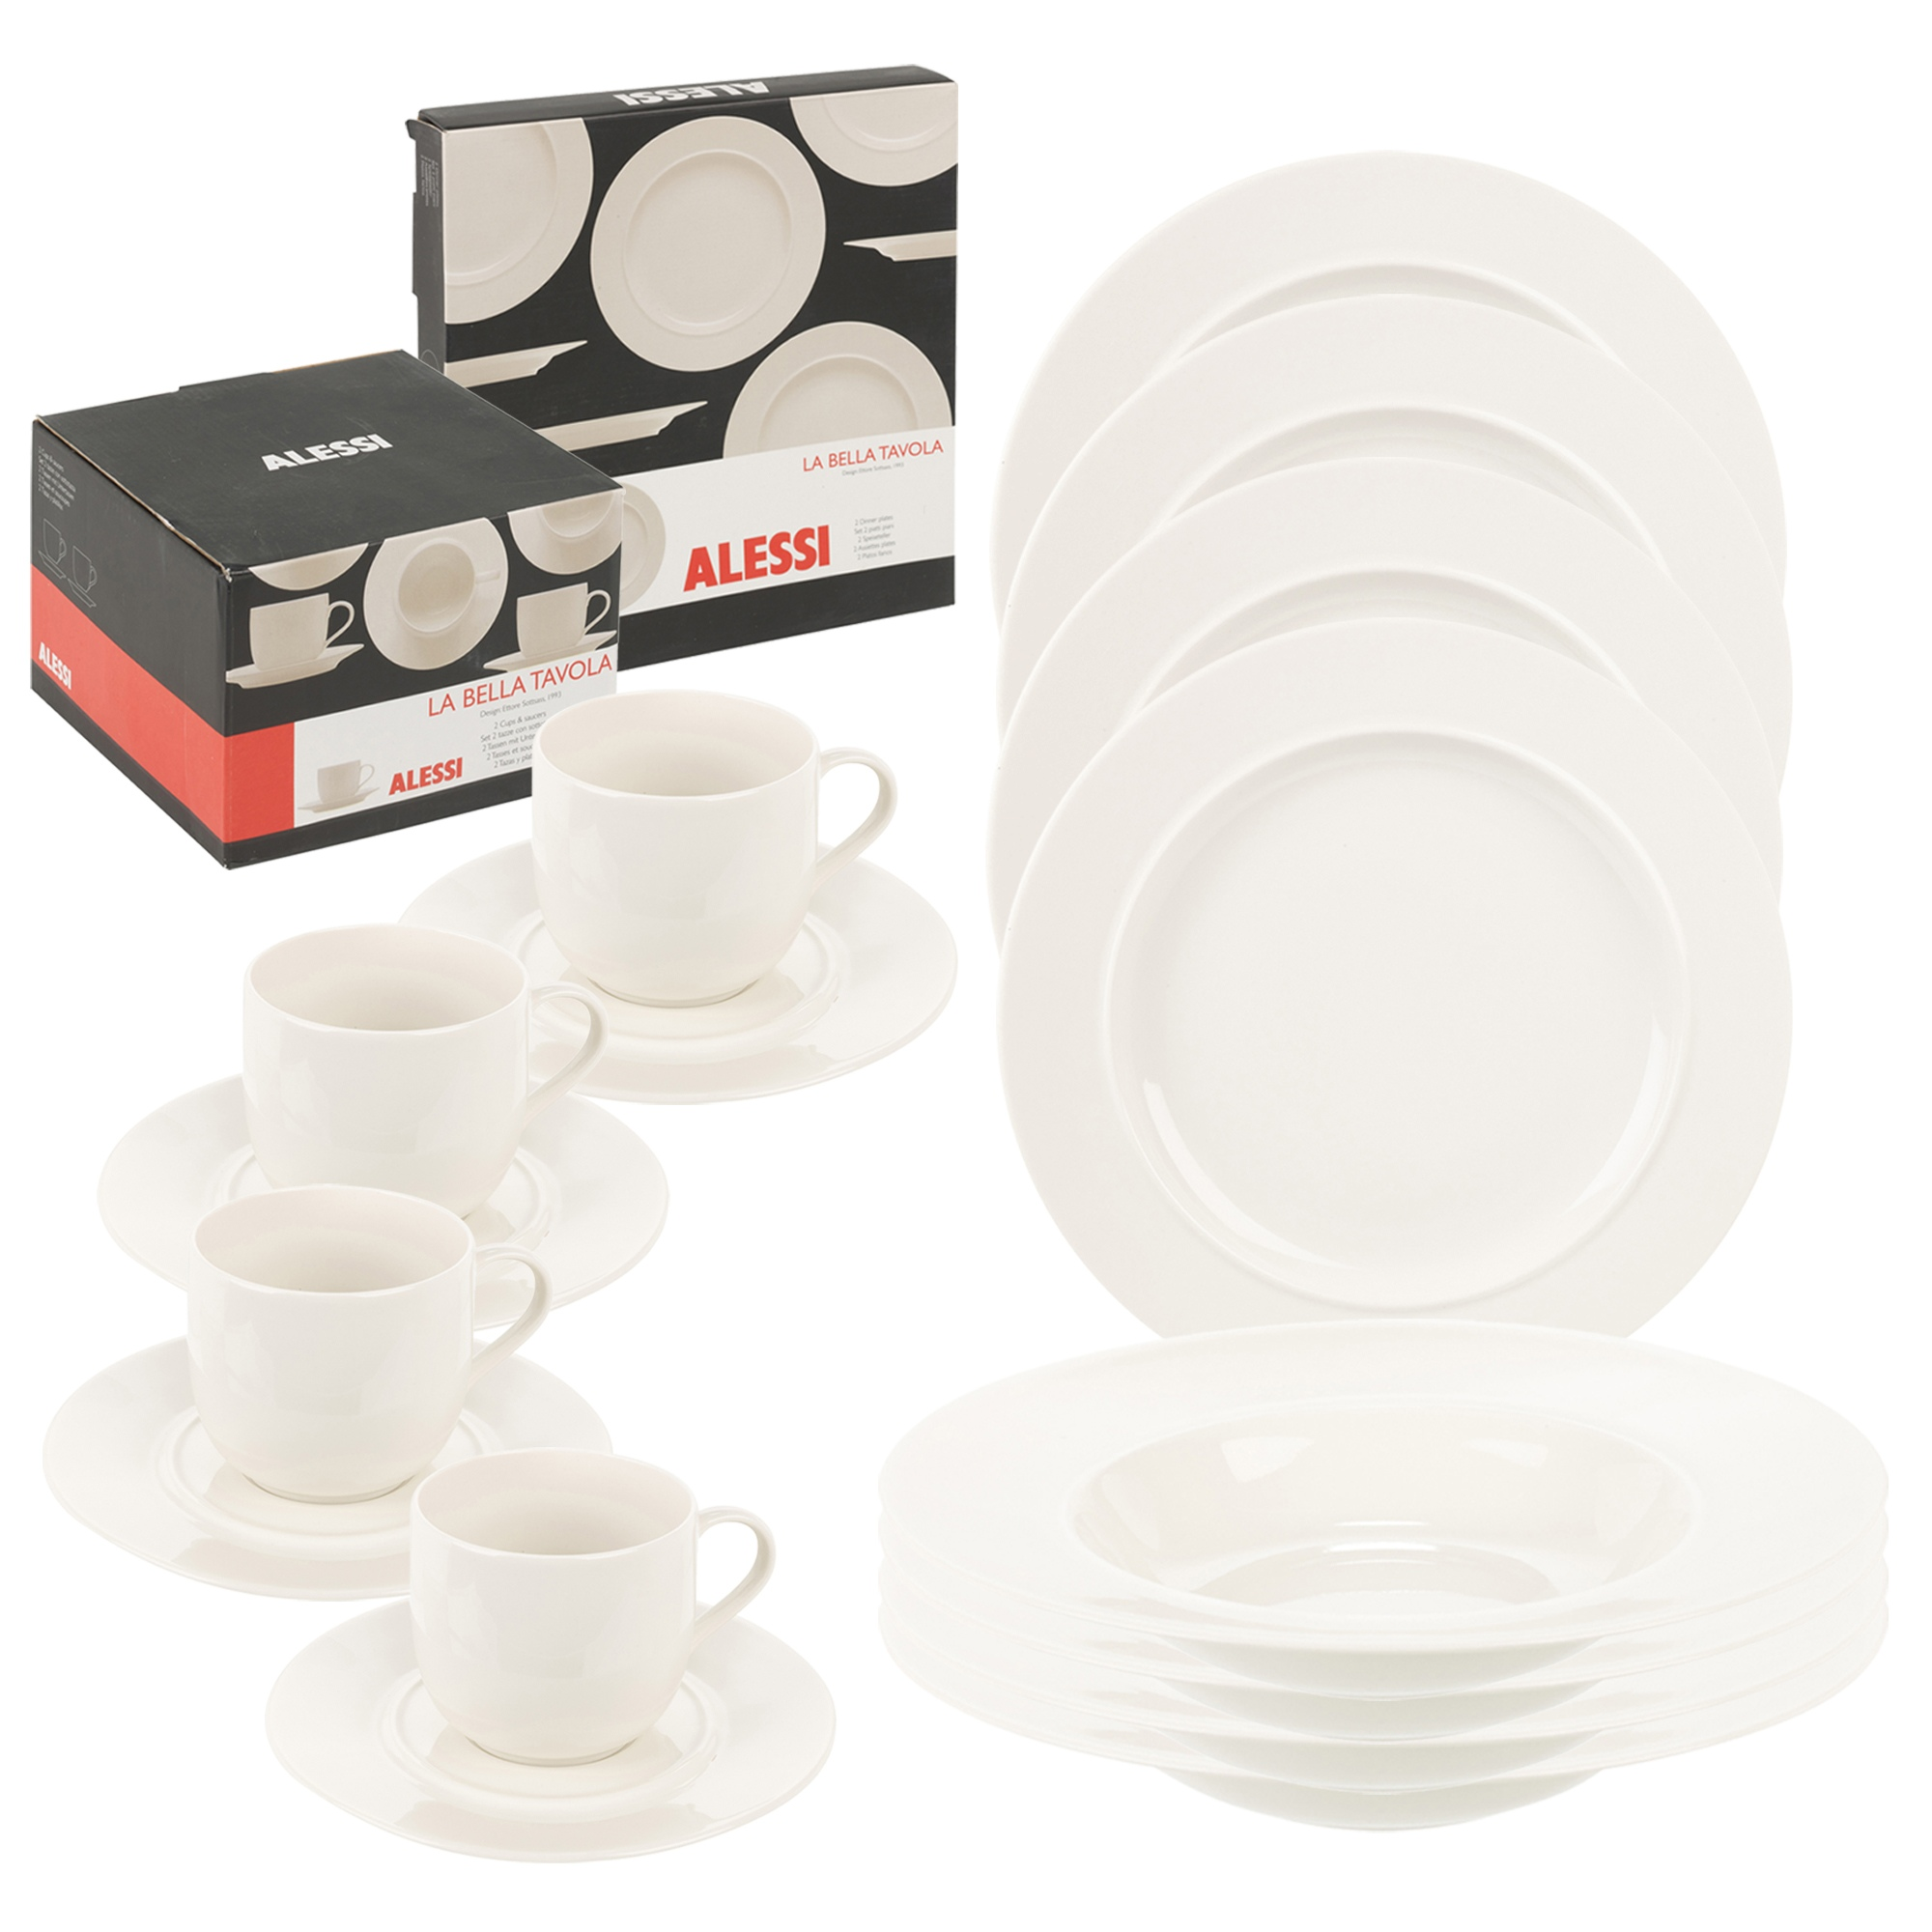 China Crockery Designer White Ceramic Cups  sc 1 st  eBay & ALESSI La Bella Dinner Service Porcelain Tableware Dining Plate Bowl ...